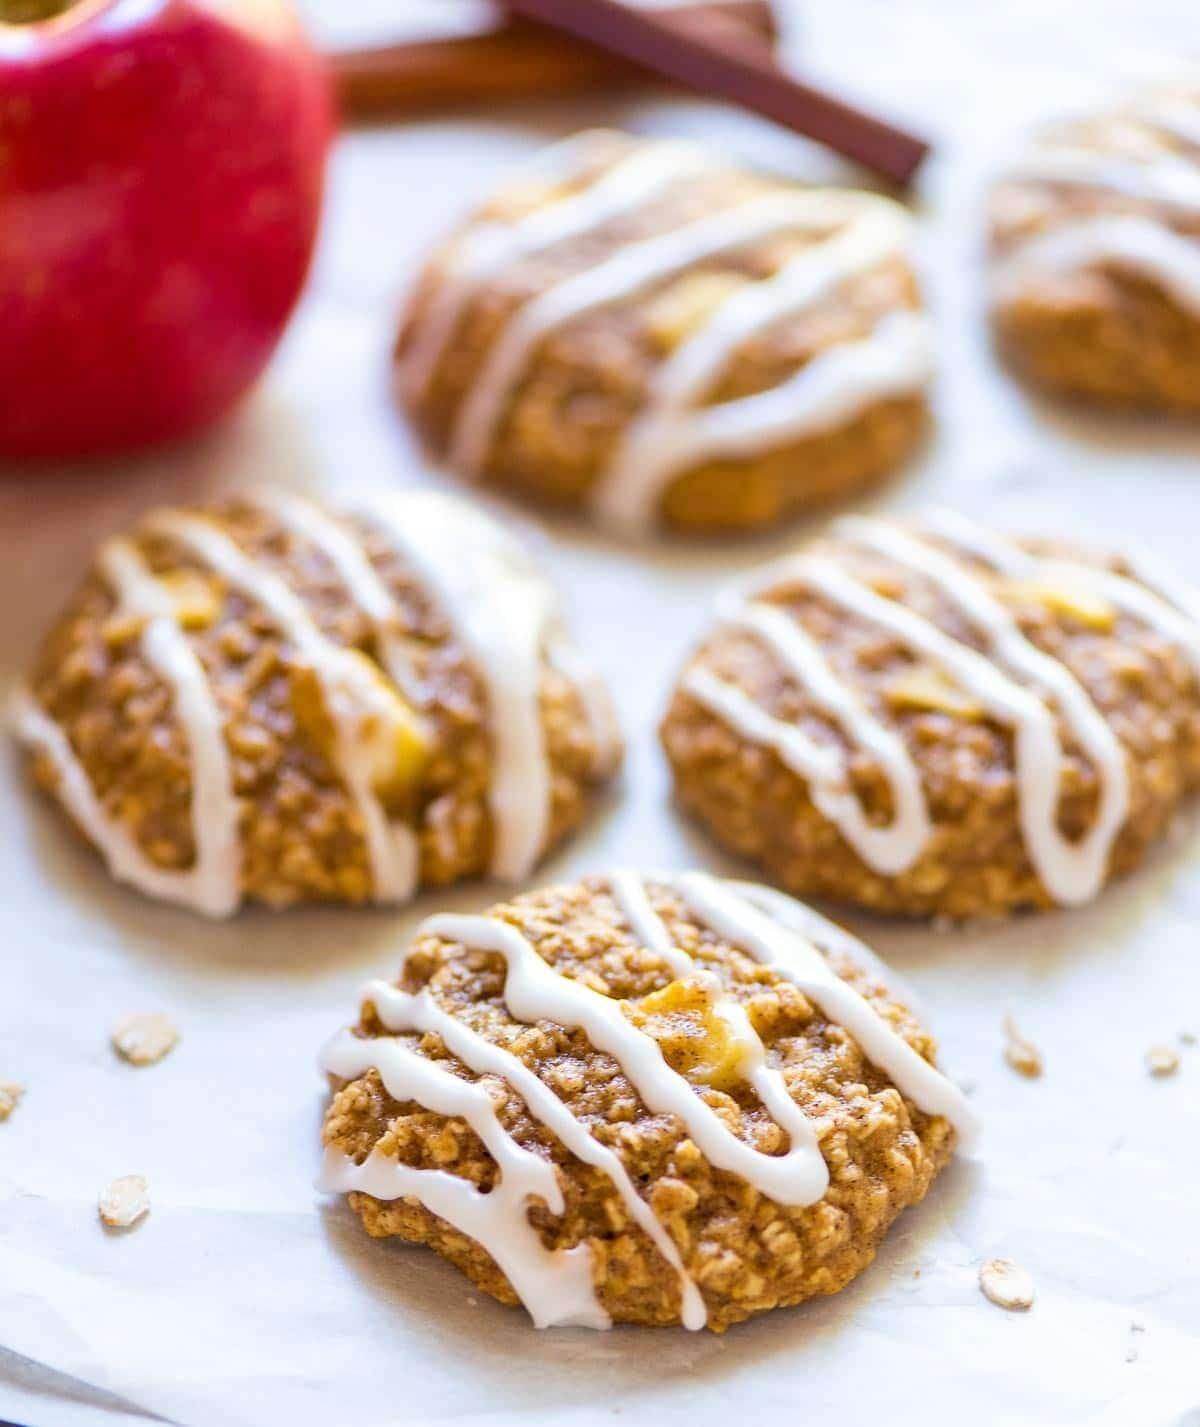 How to Make Apple Pie Oatmeal